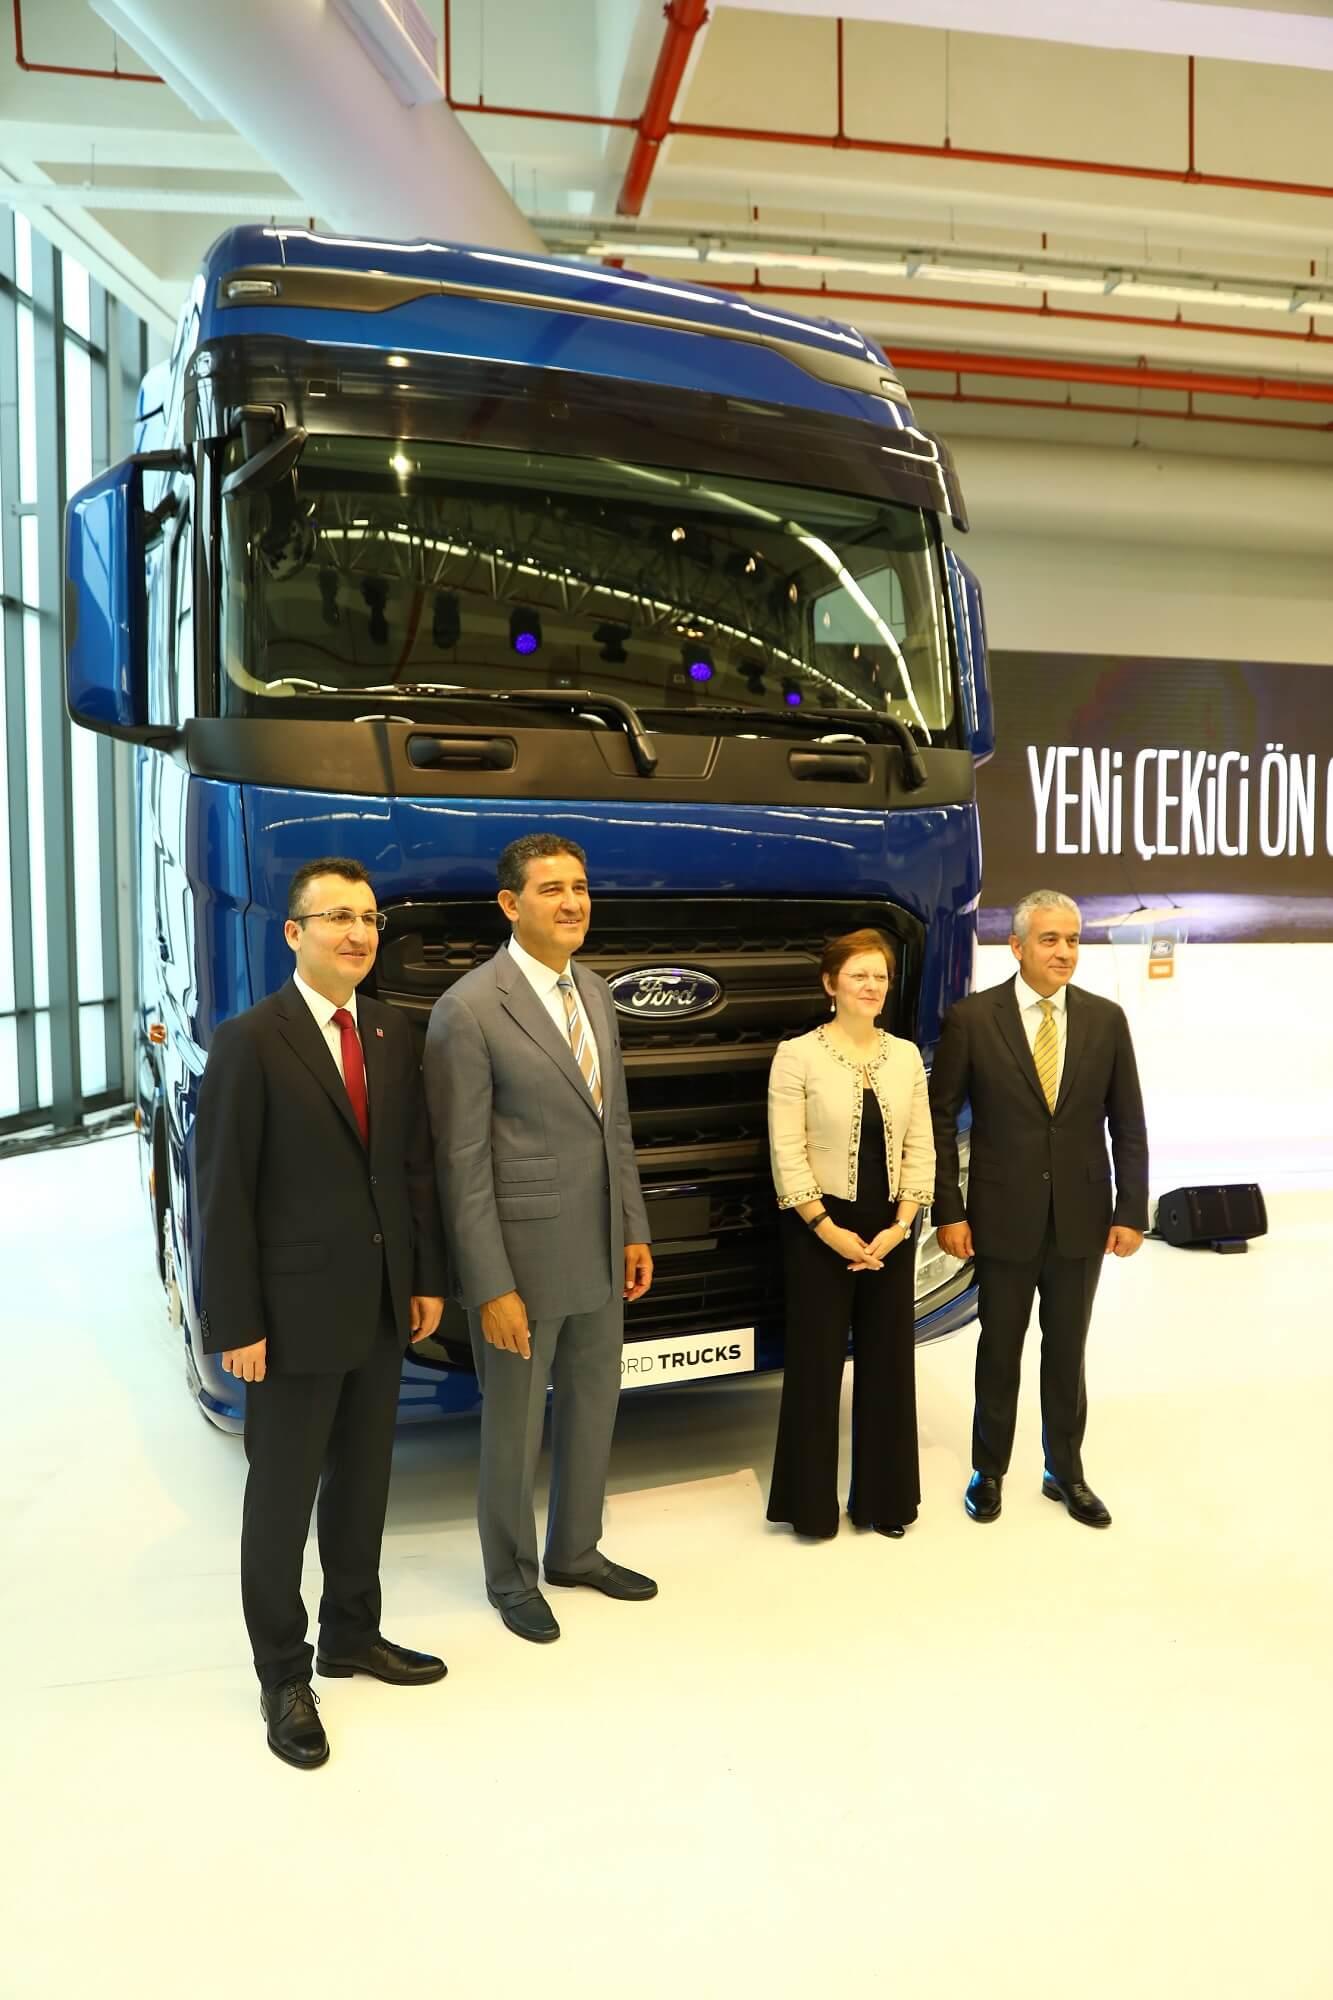 Ford Trucks 2016 >> Ford Trucks'ın Yeni Çekicisi Karşınızda!   Ford Otosan Blog